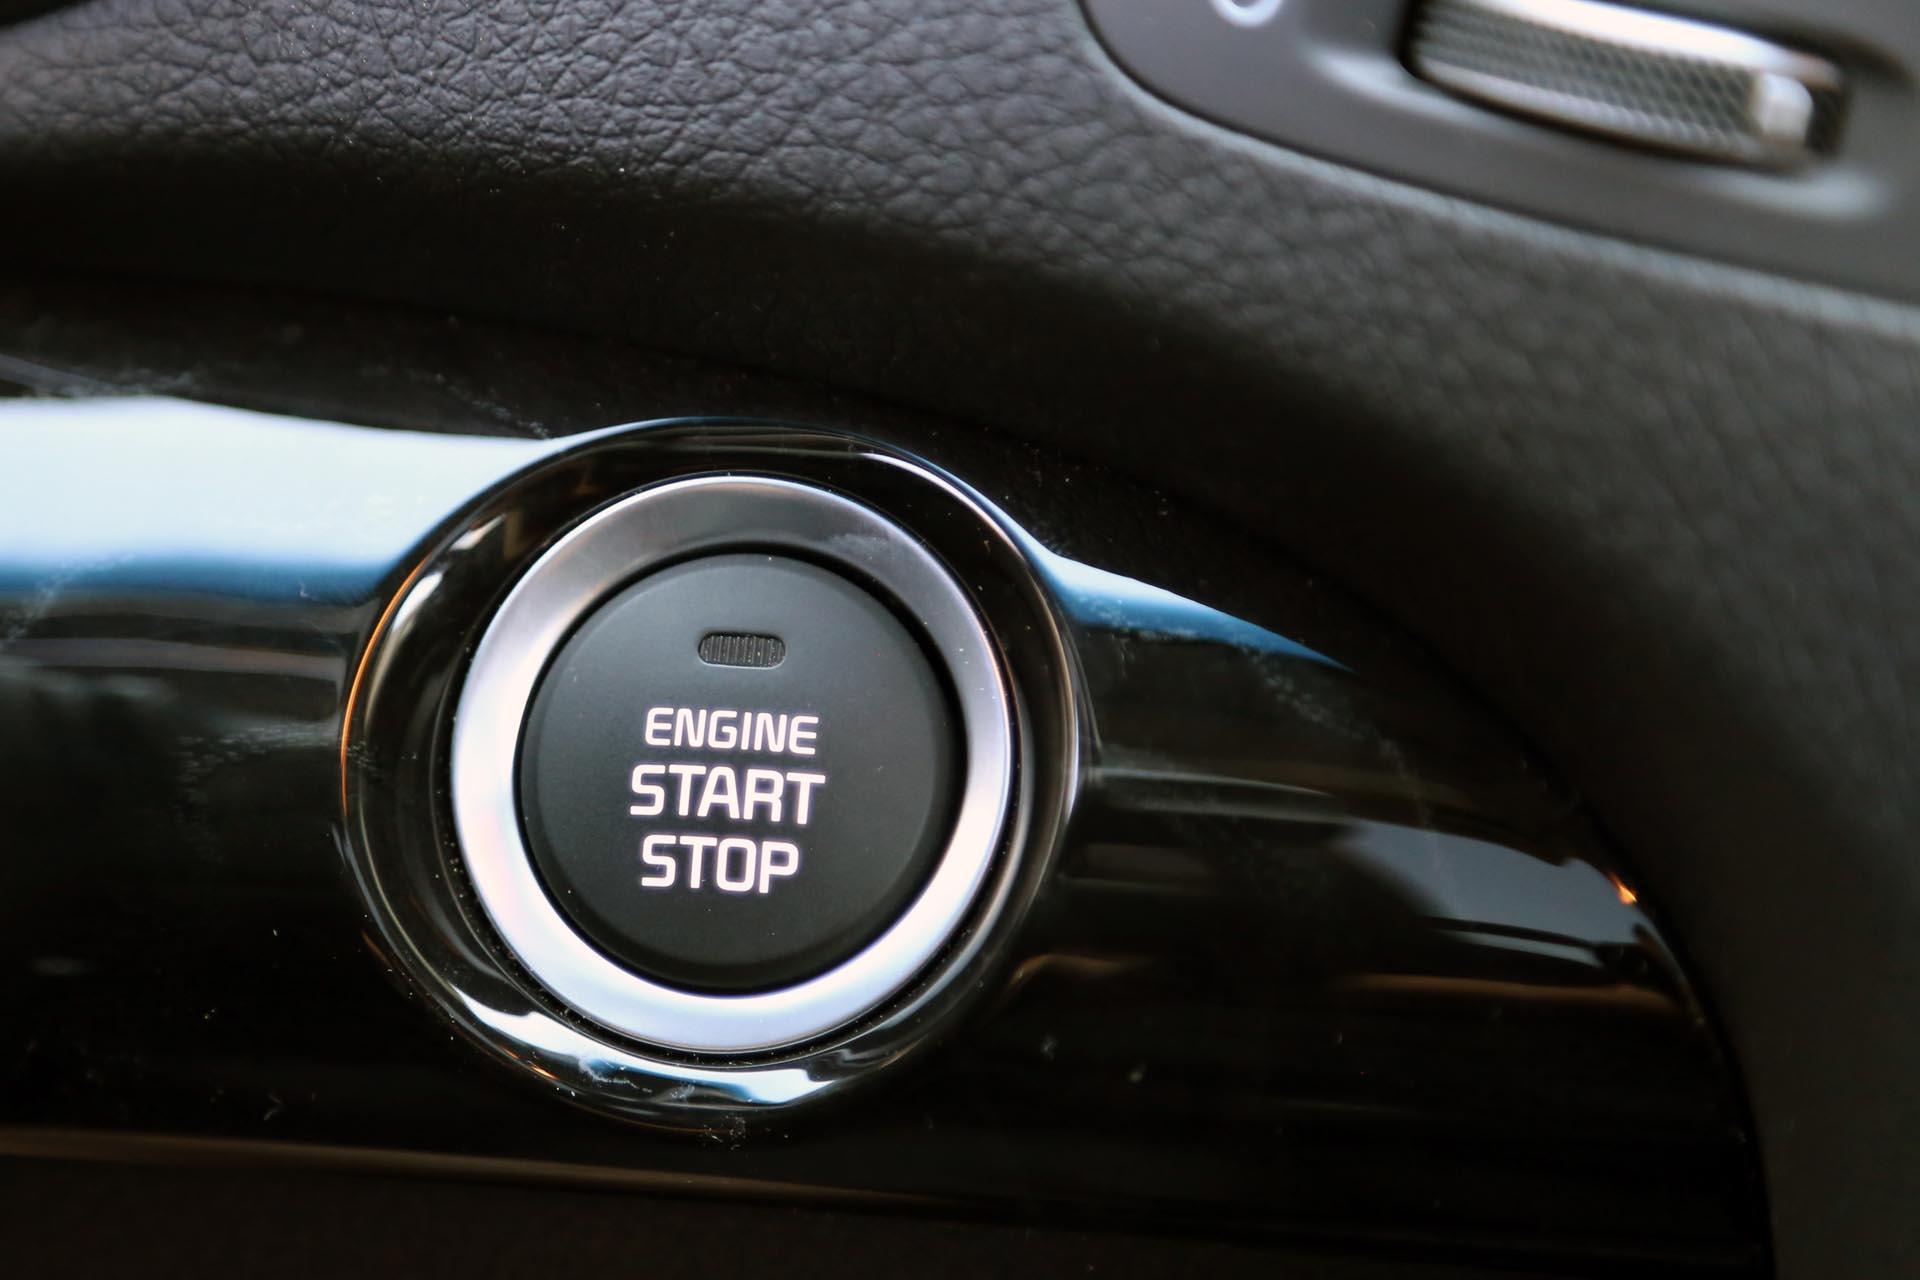 Kia Sorento: Engine startstop button